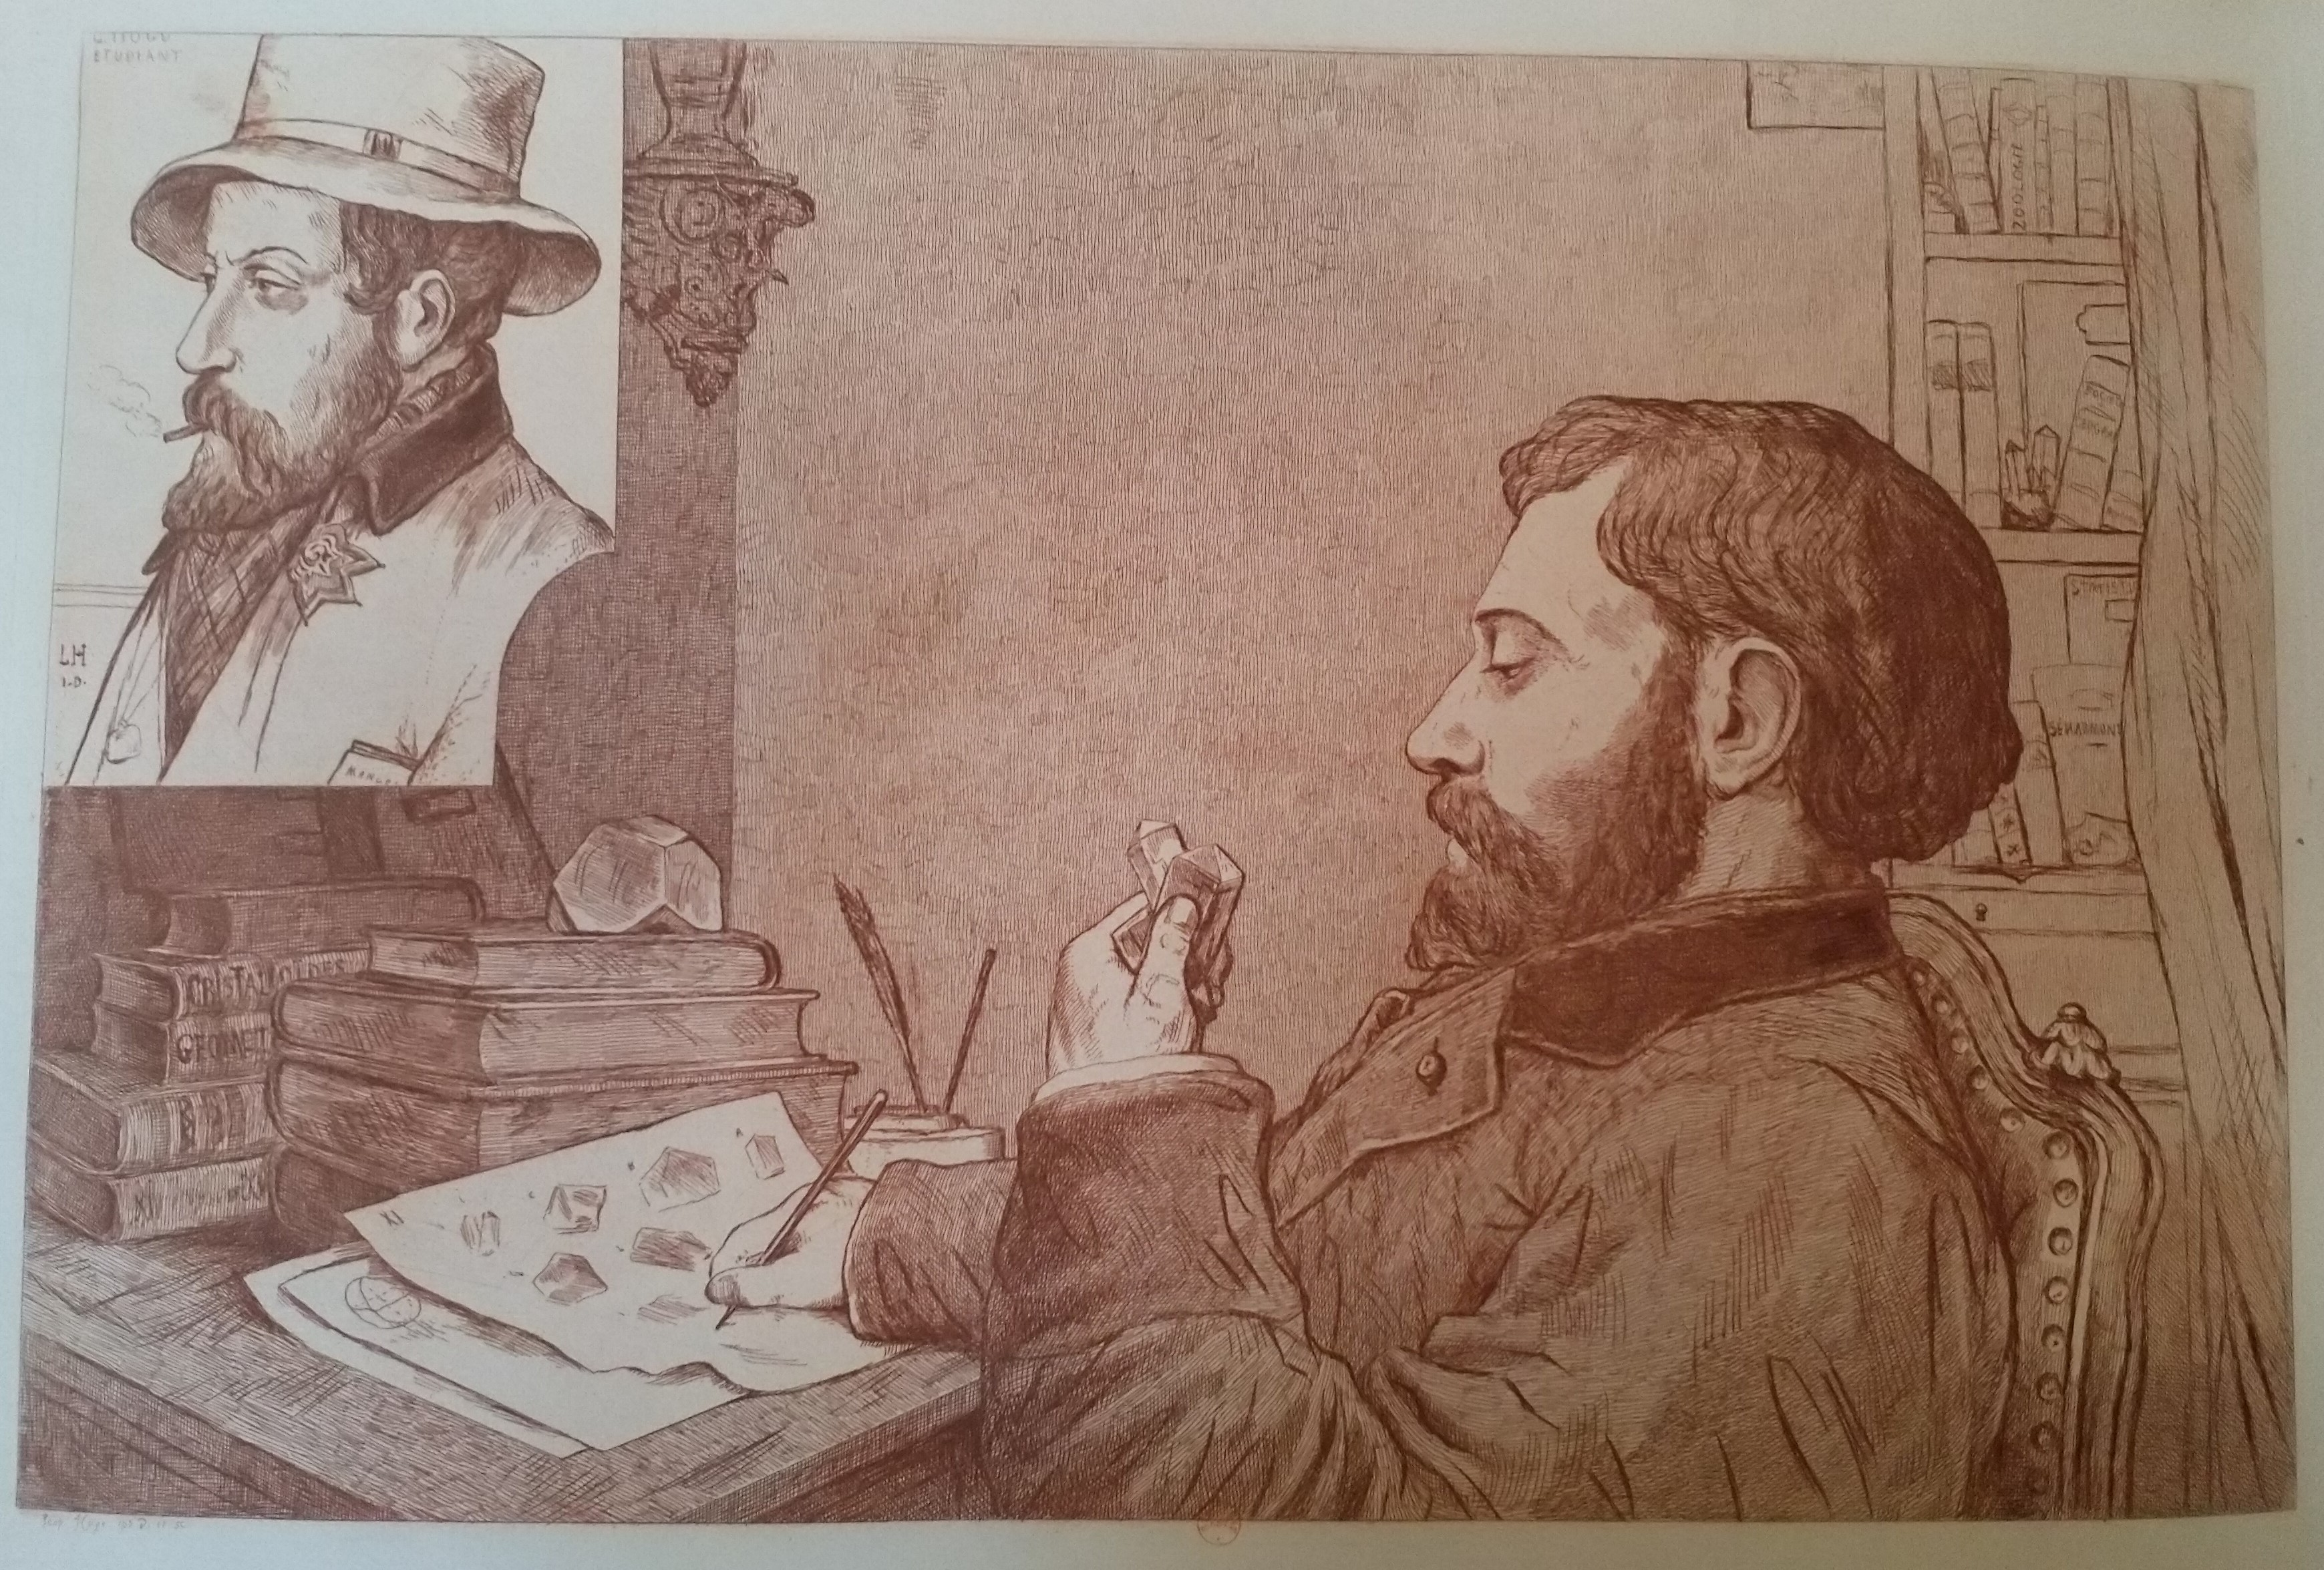 Leopold Armand Hugo BNF Autoportrait etudiant